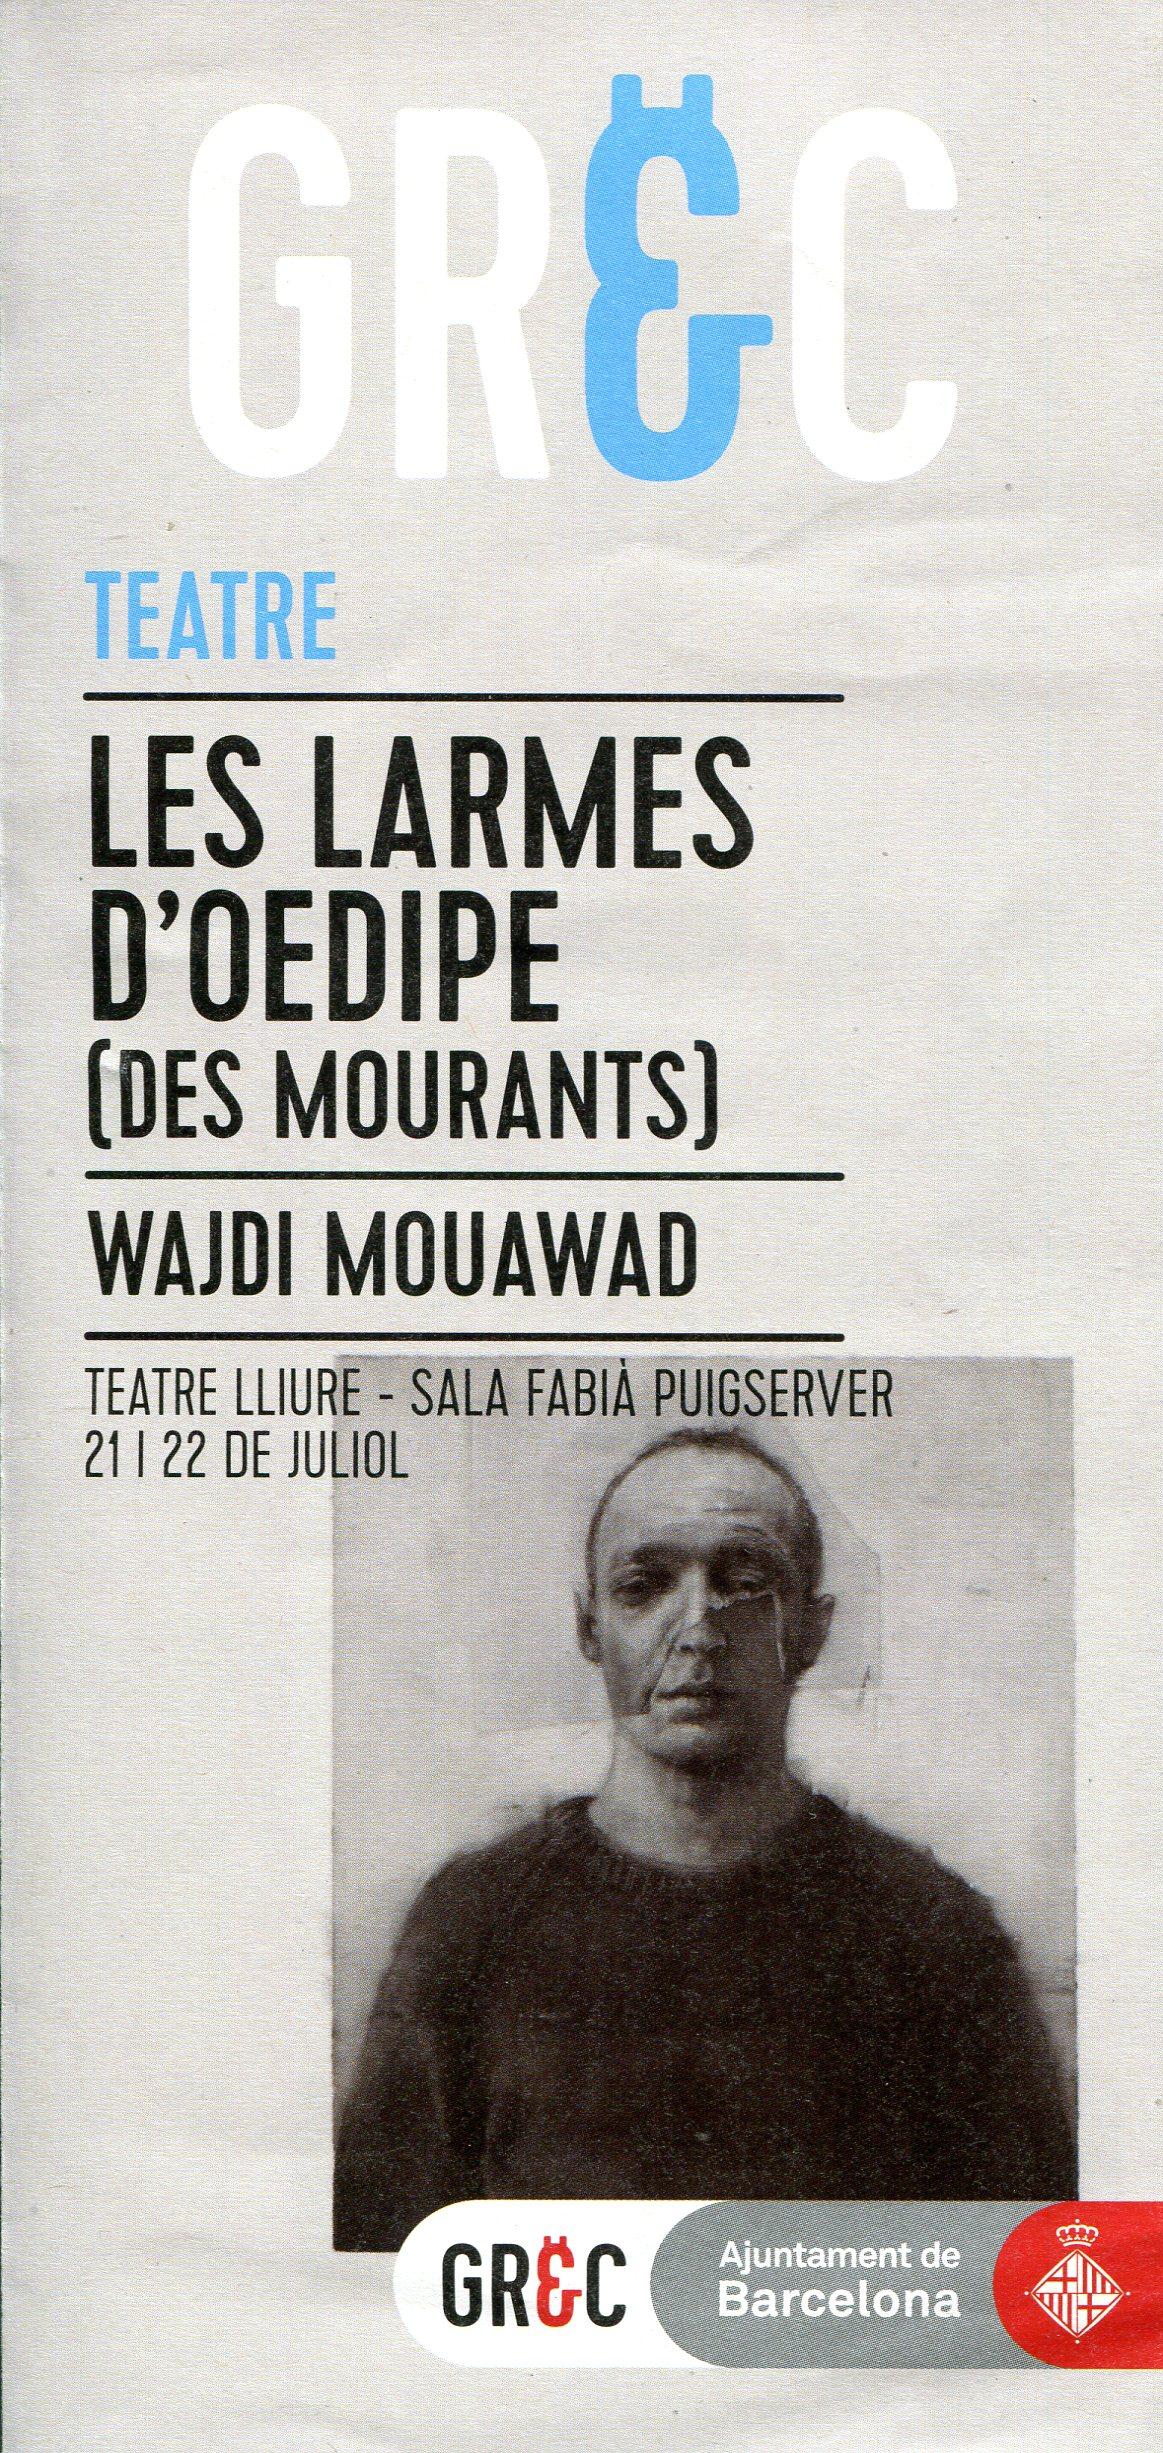 2017 07 21 Wajdi Mouawad Des Mourants 02.jpg